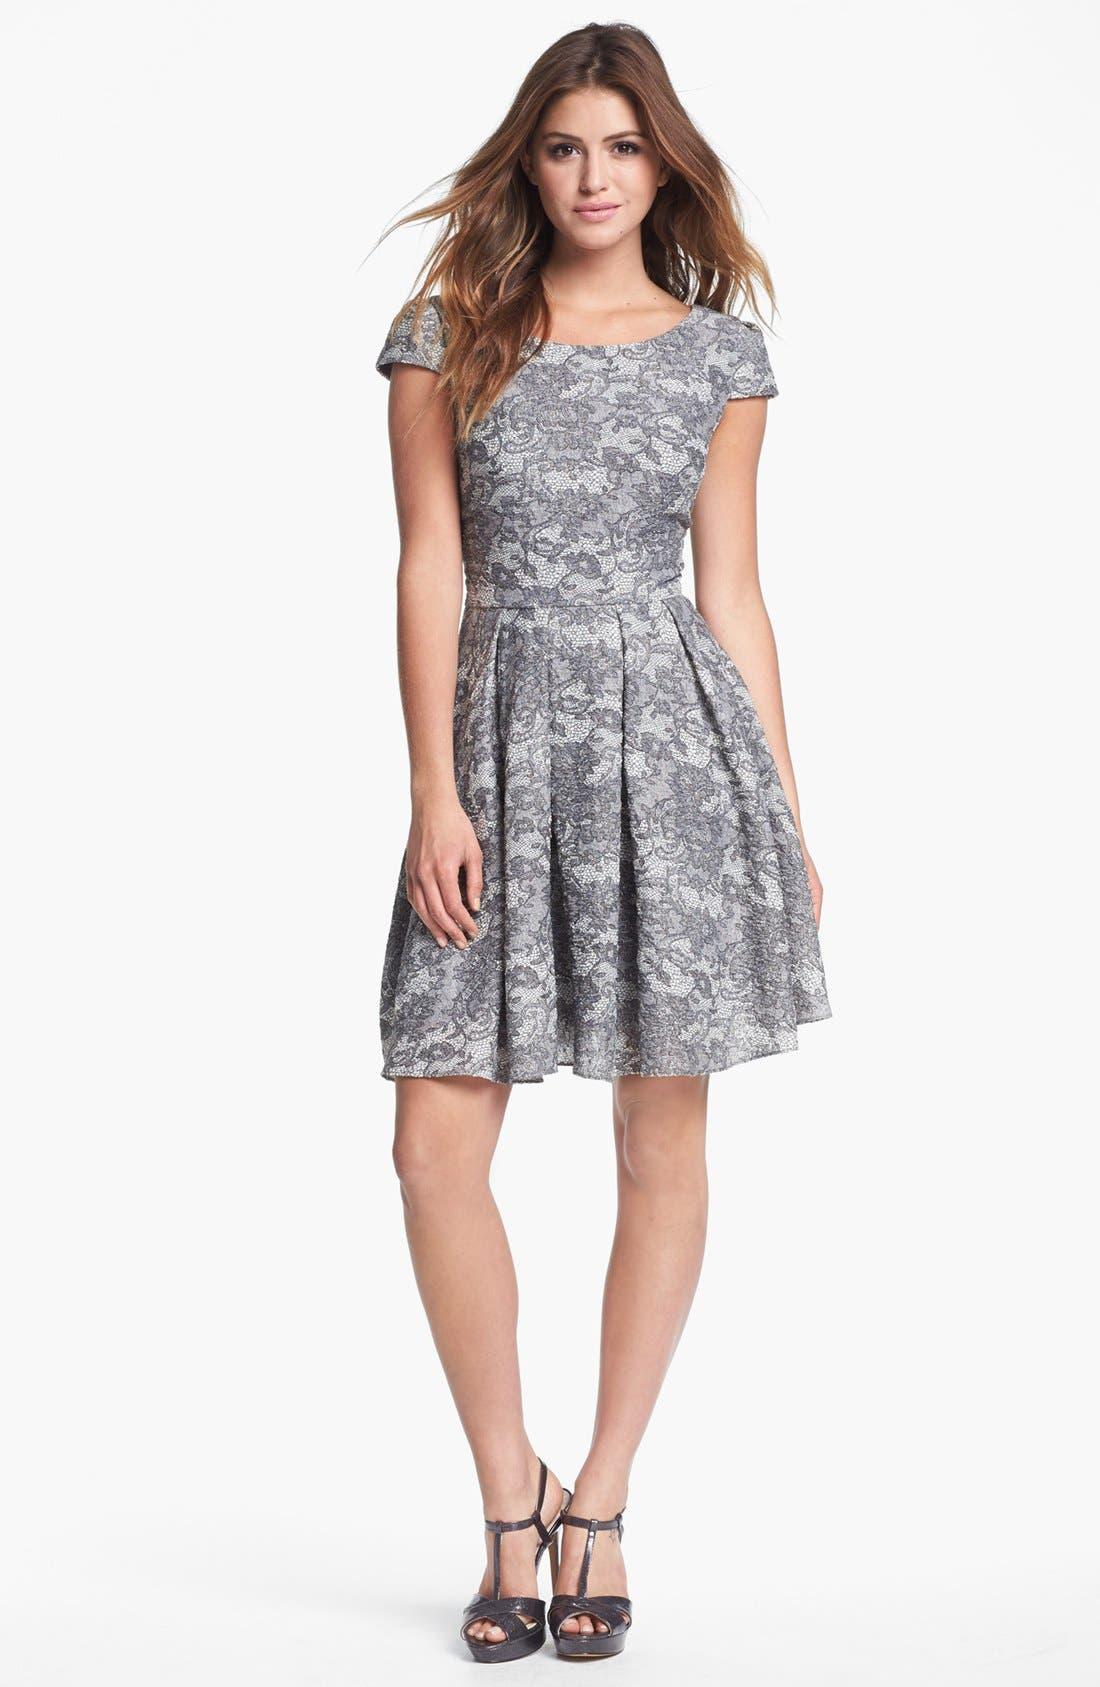 Main Image - Betsey Johnson Lace Print Fit & Flare Dress